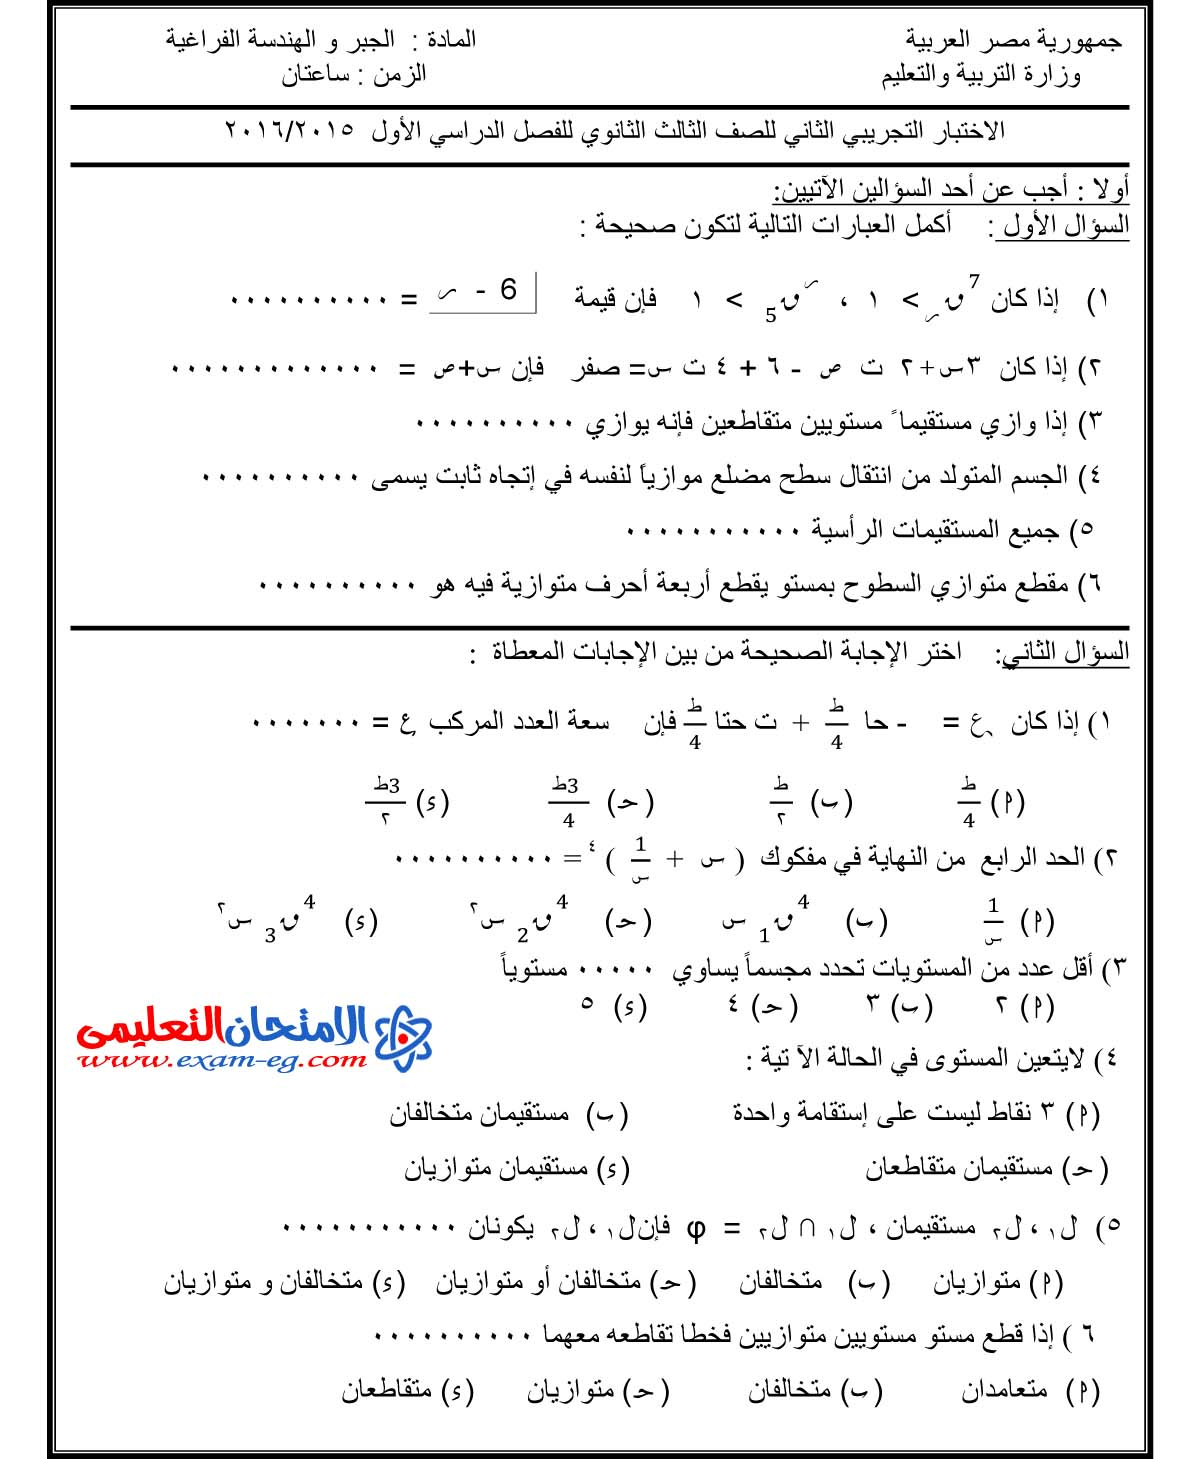 exam-eg.com_1460421182943.jpg